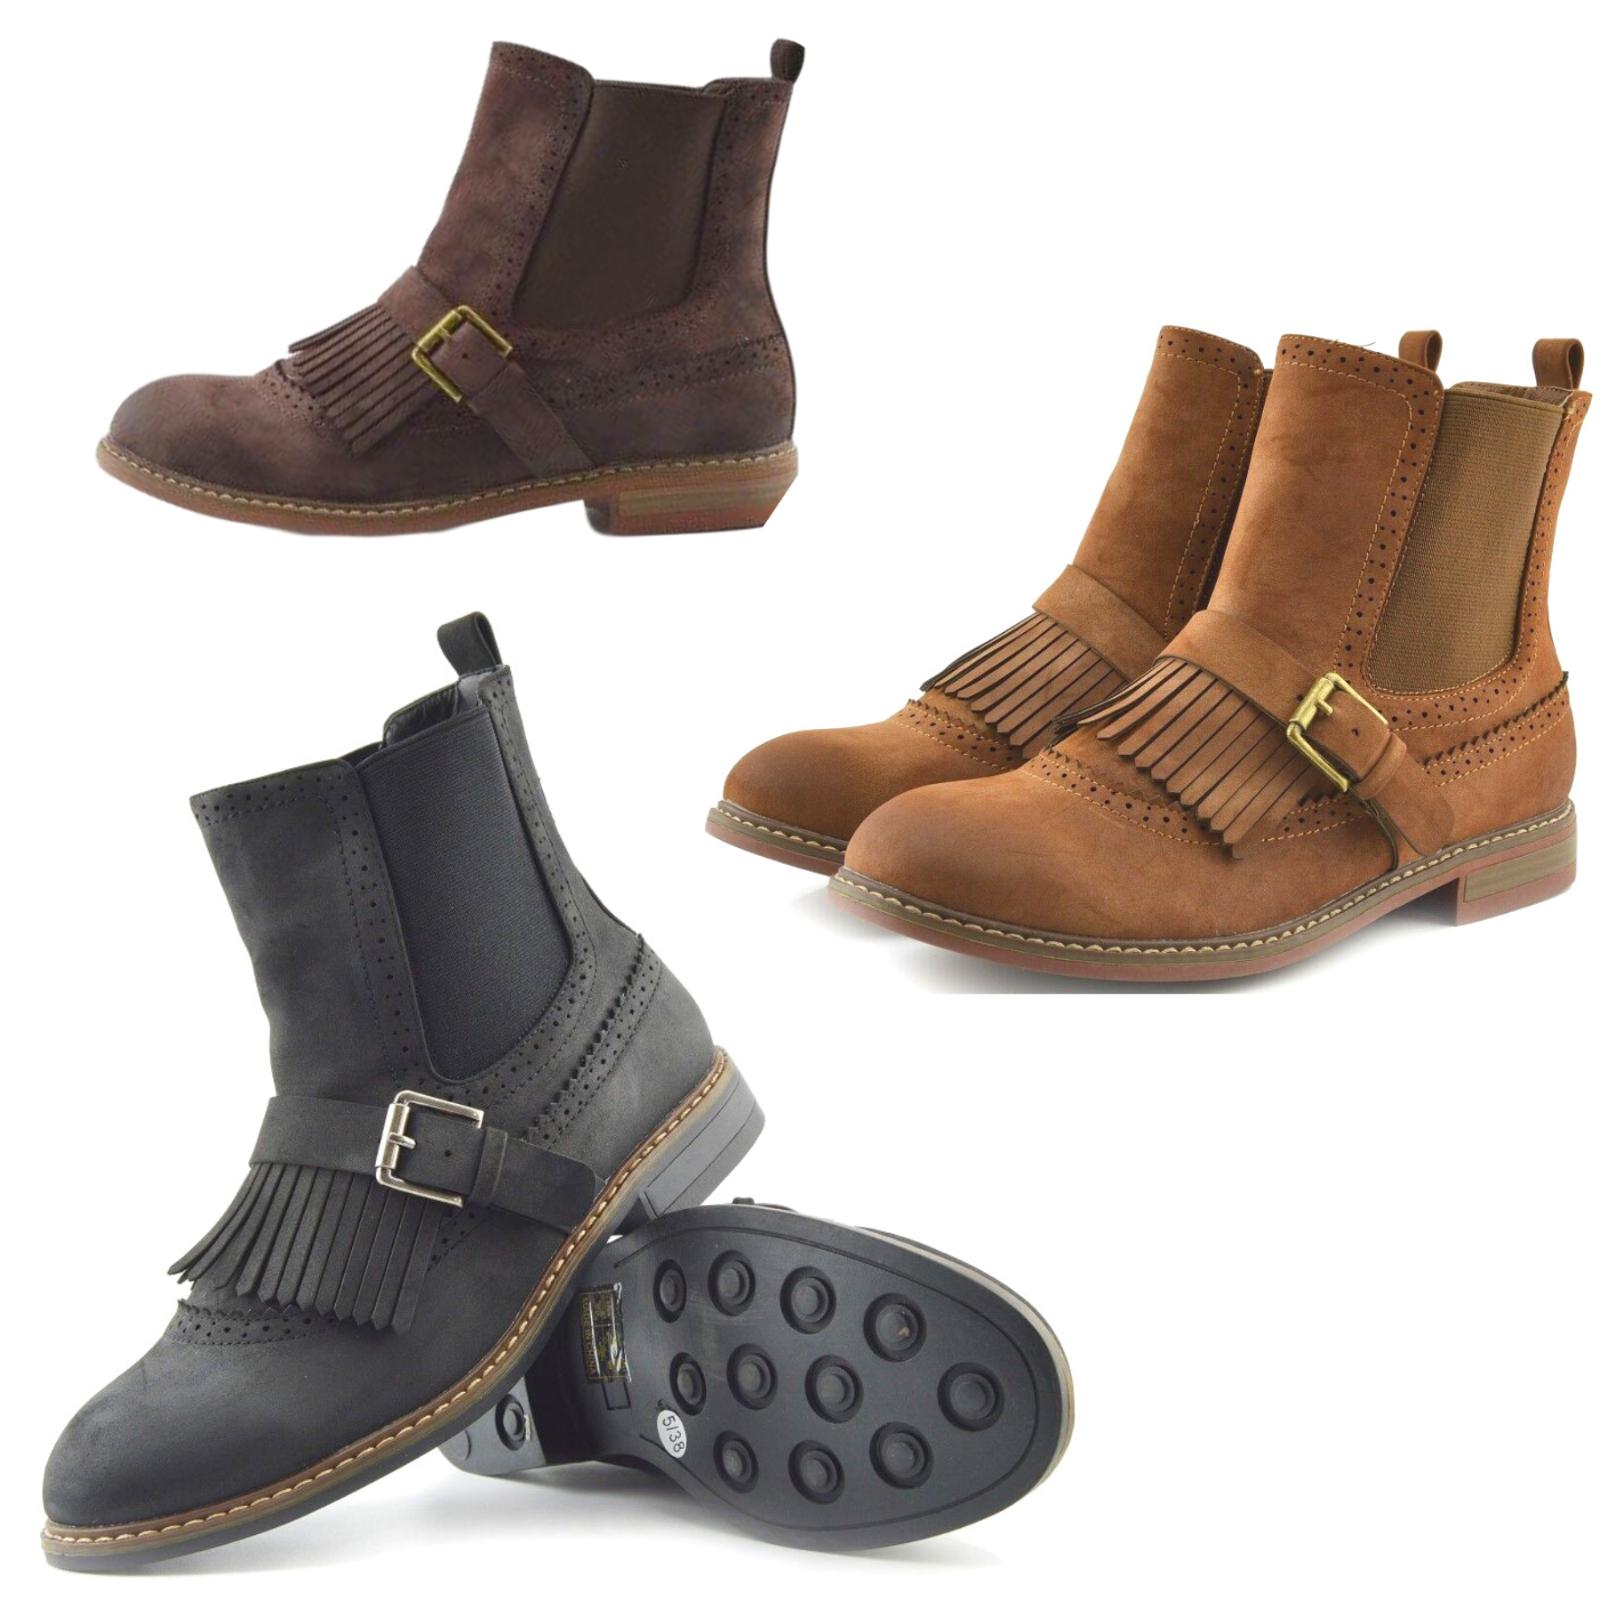 Women's Ladies Casual Brogue Ankle Shoes Retro Dealer Boots Black Tan Brown Size